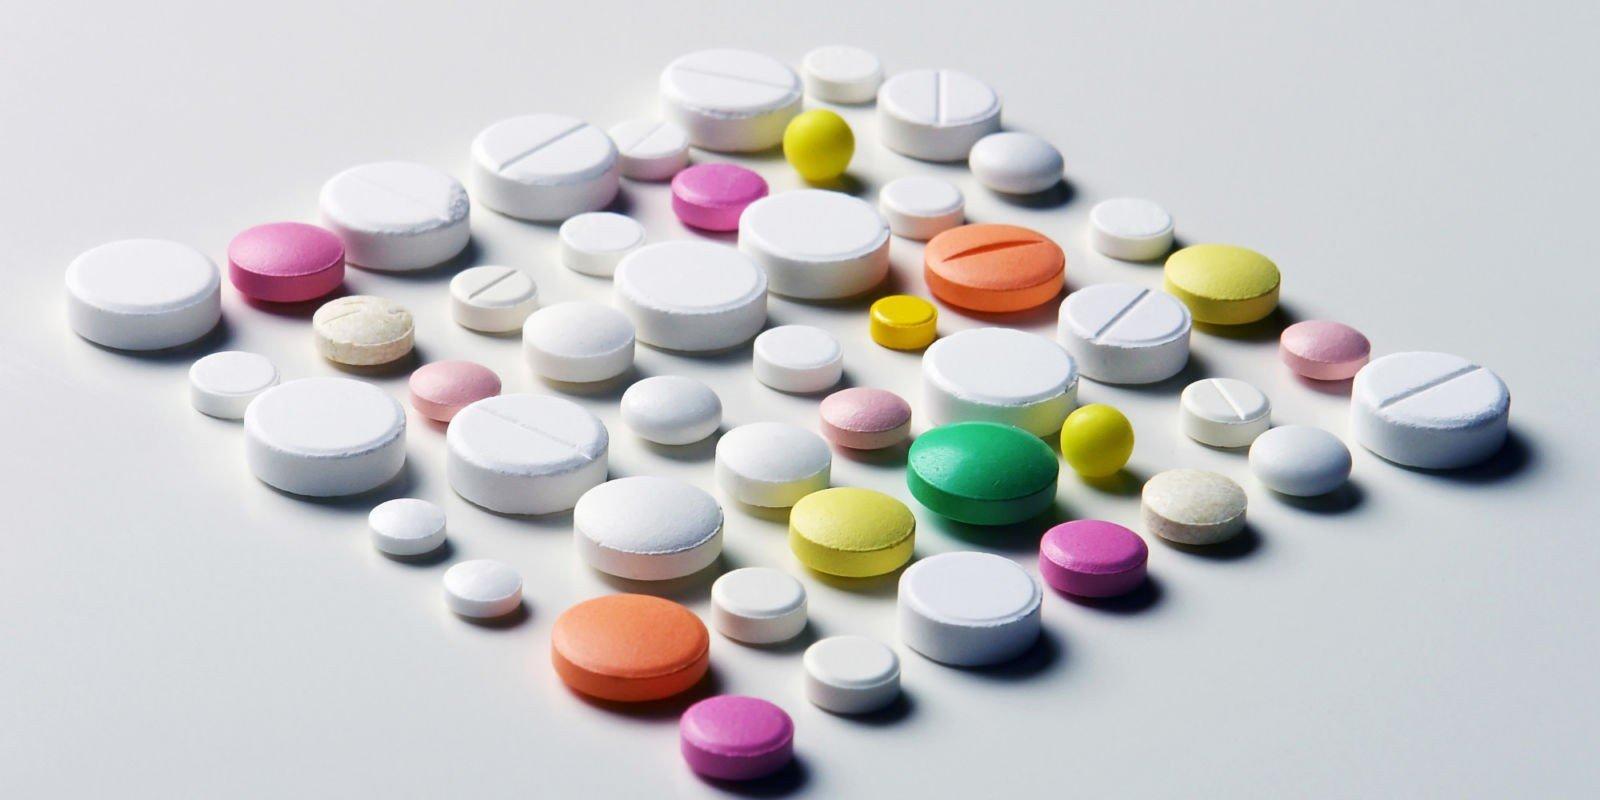 Антибиотики при простуде для взрослых и детей. Антибиотики при ОРВИ, гриппе, насморке